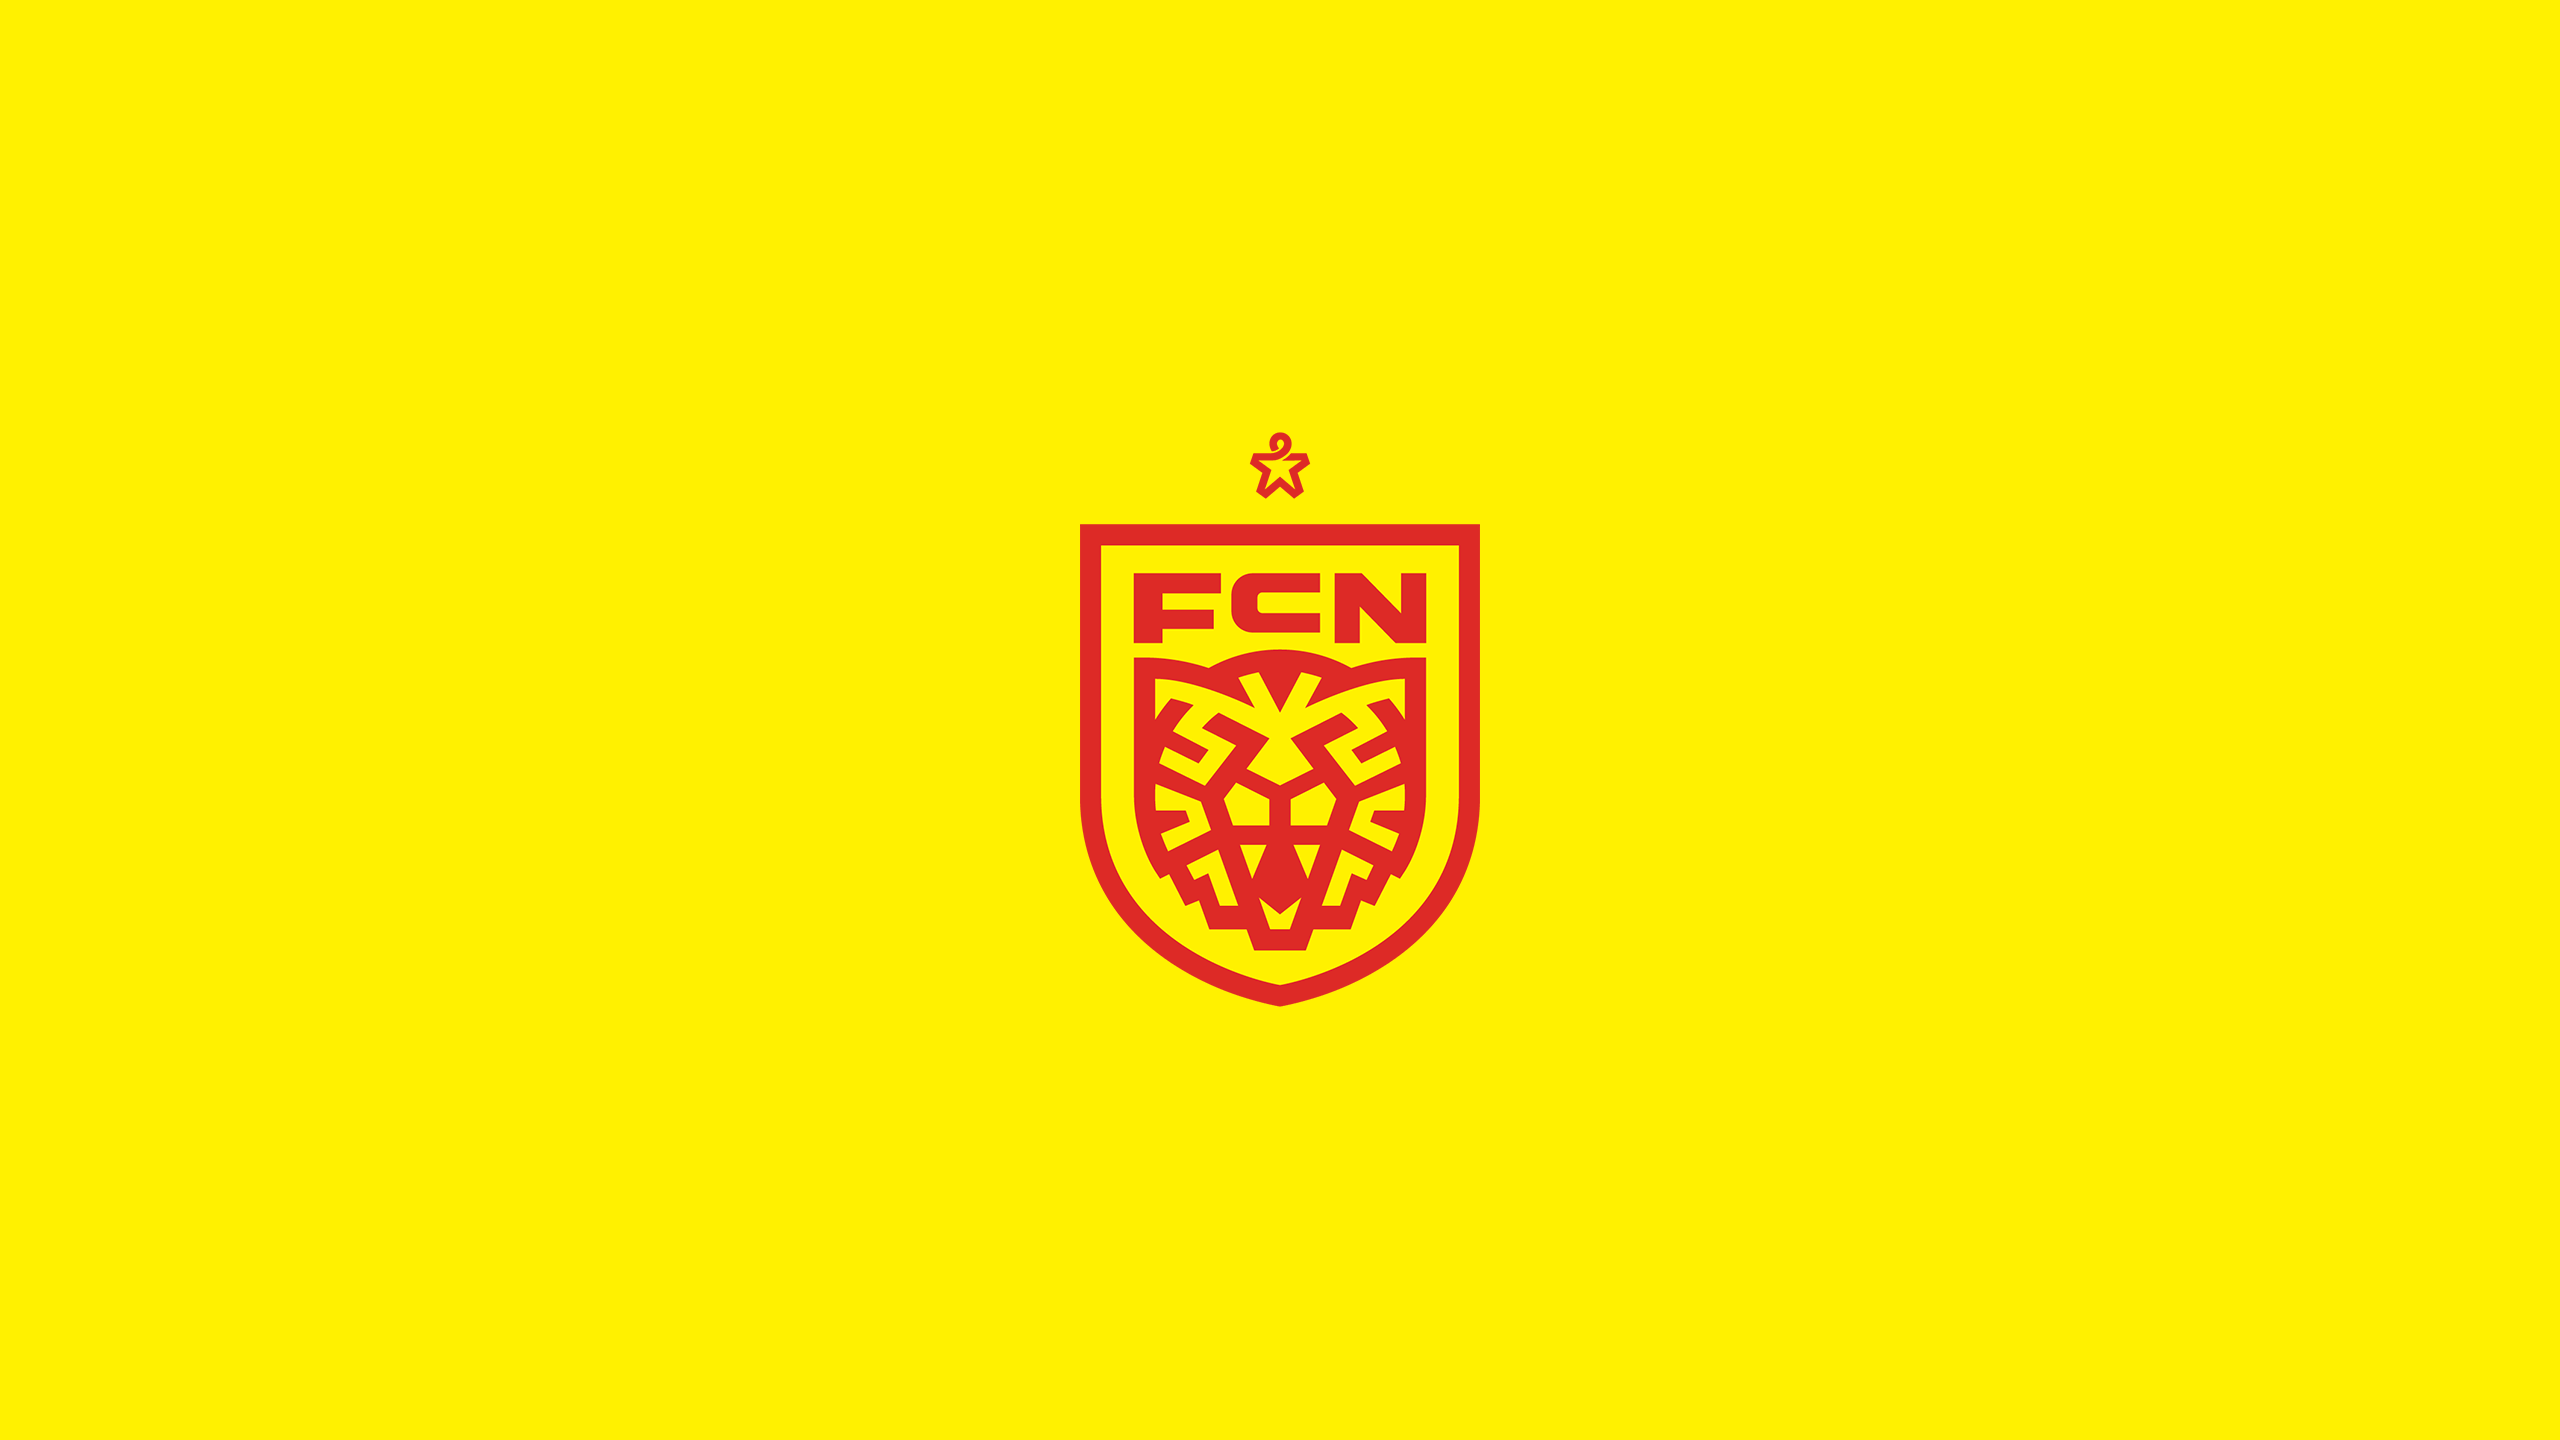 FC Nordsjaelland (Away)